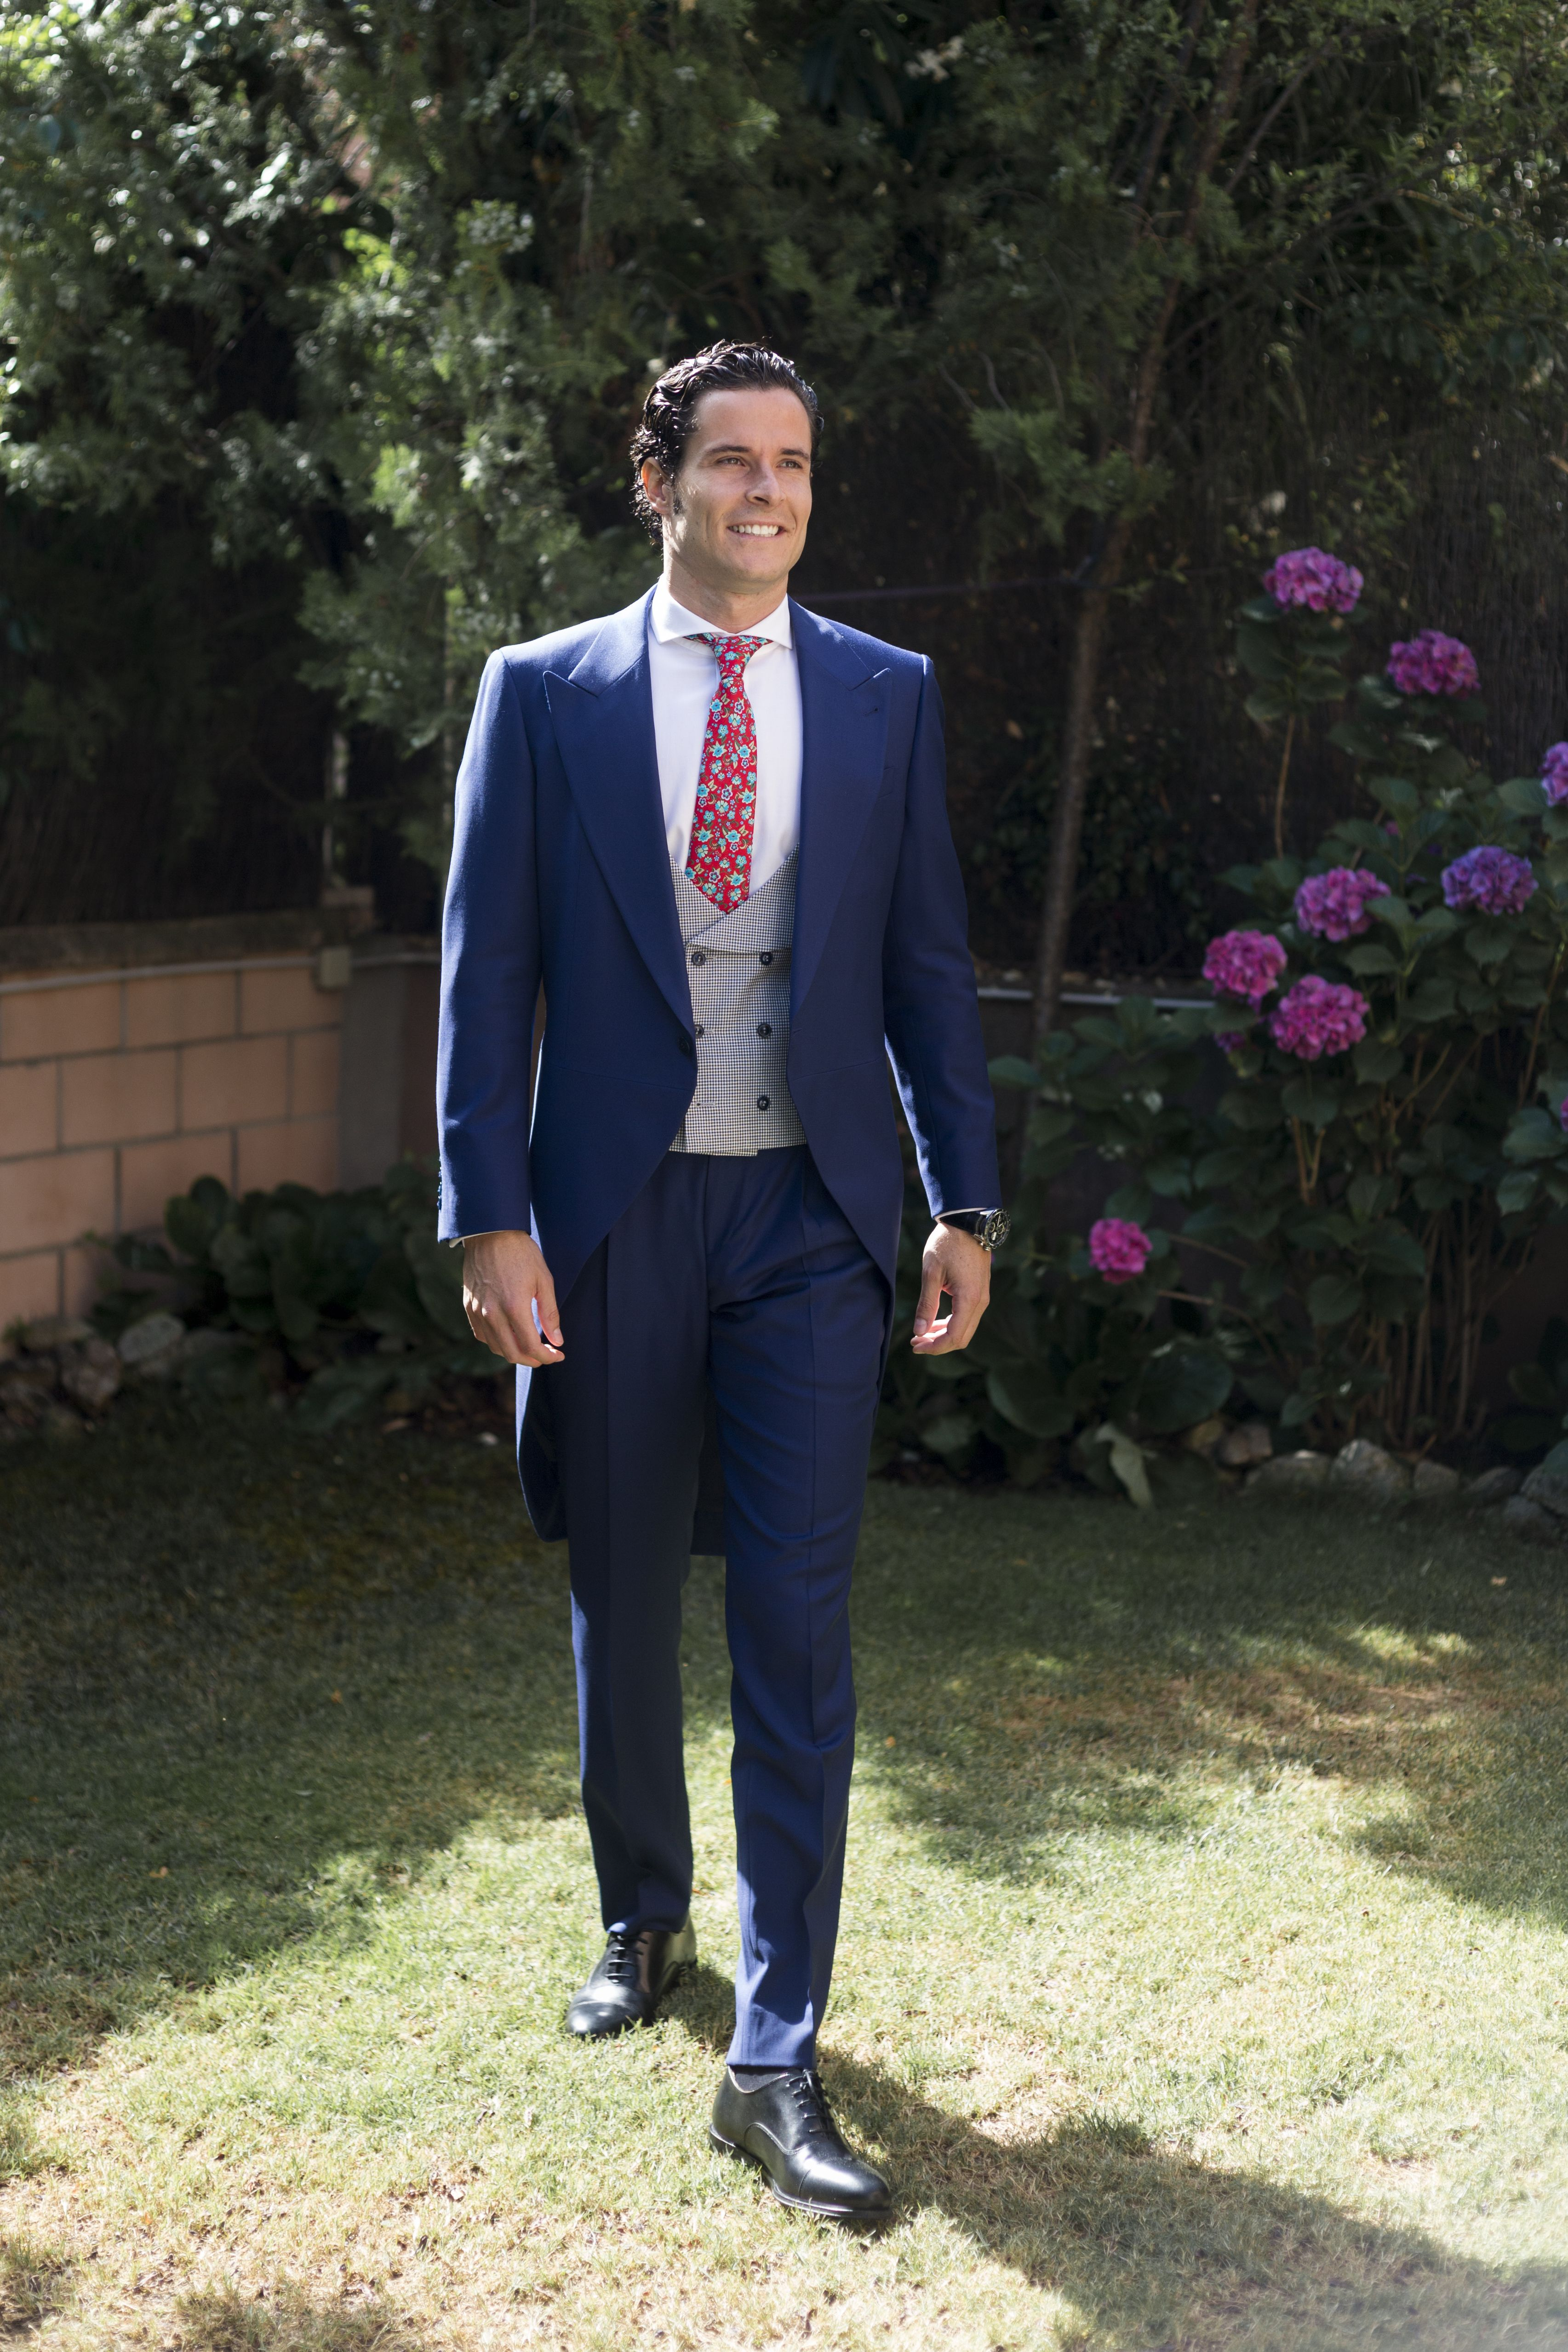 Chaqué de novio a medida azul tinta.  tomblack  sastreria  chaque  traje   azul  novio  boda  wedding  chaleco 7fdb4be355a